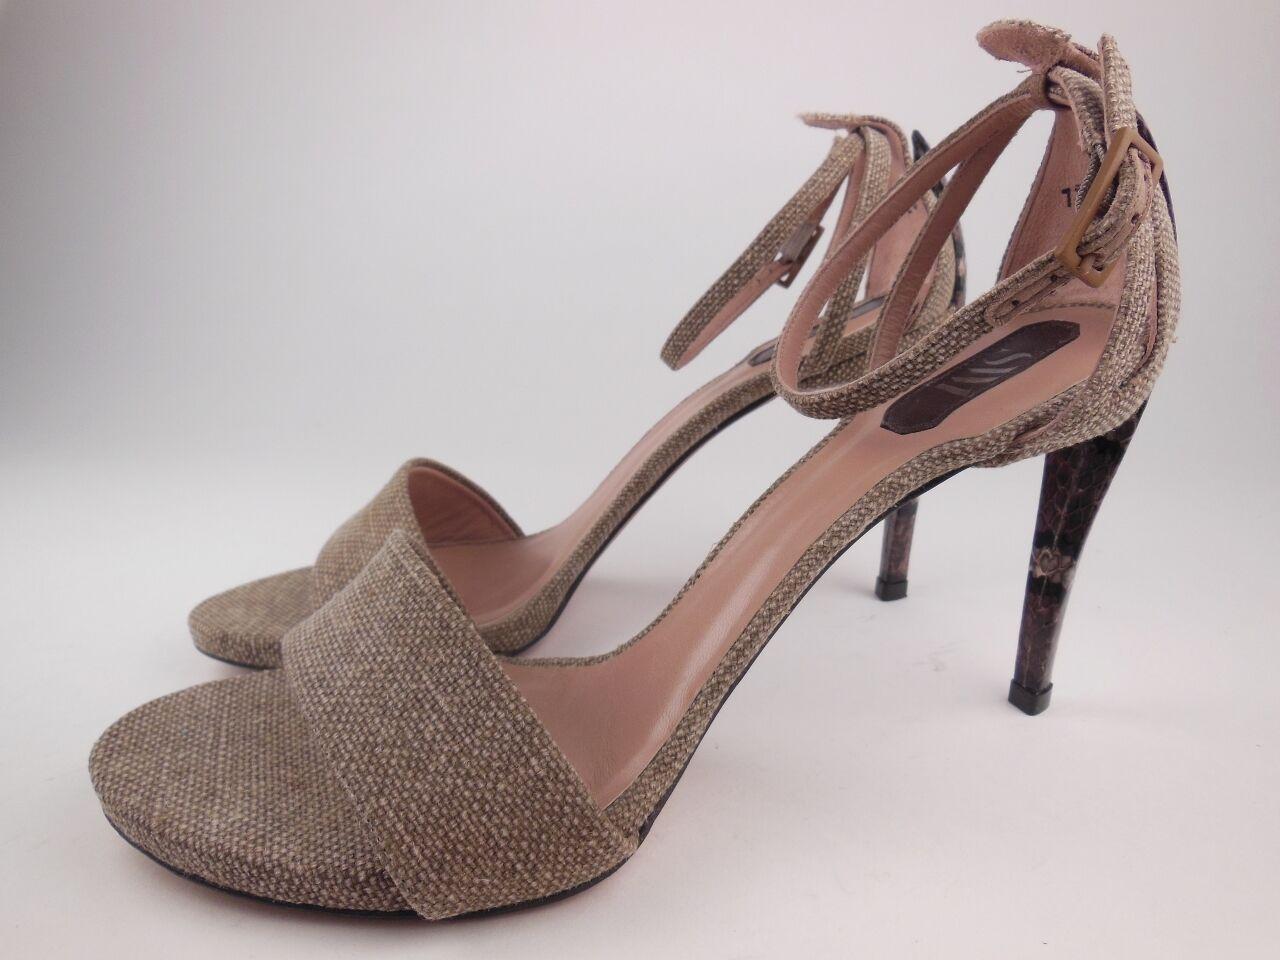 STUART WEITZMAN SW1 Green Fabric Ankle Strap Heeled Sandals Sz 9.5 M